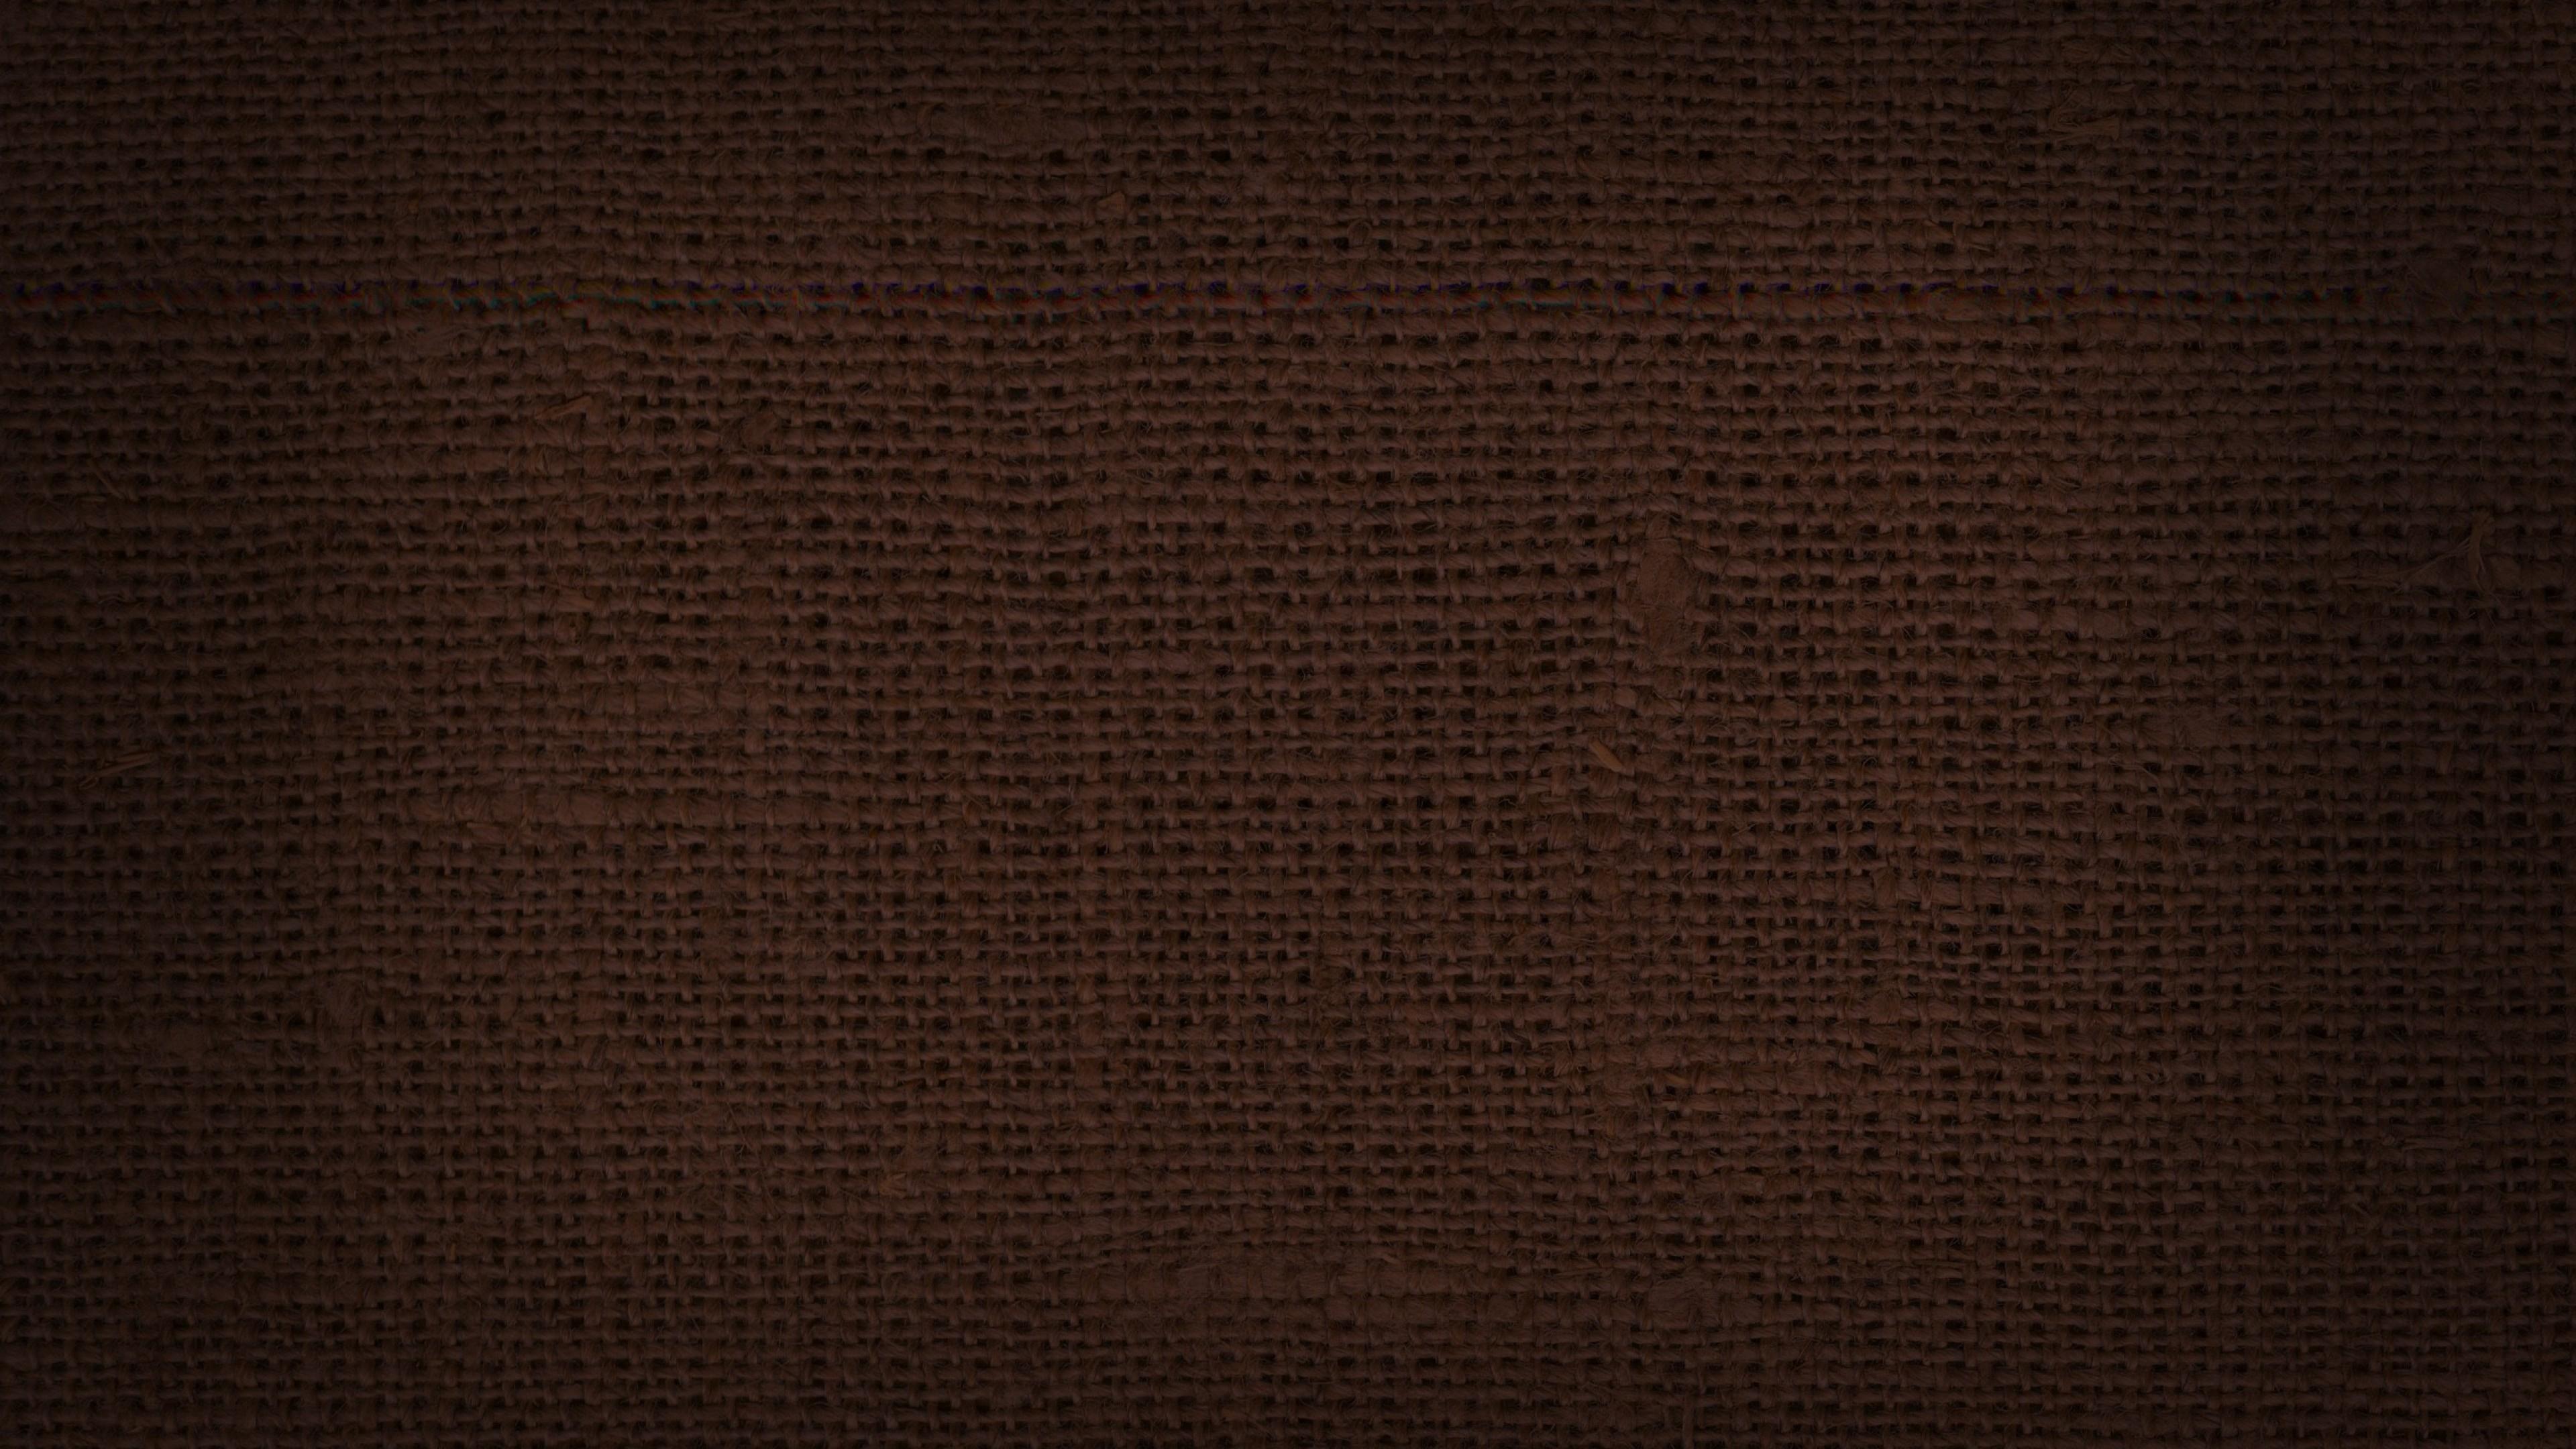 Wallpaper grid, cells, dark, cloth